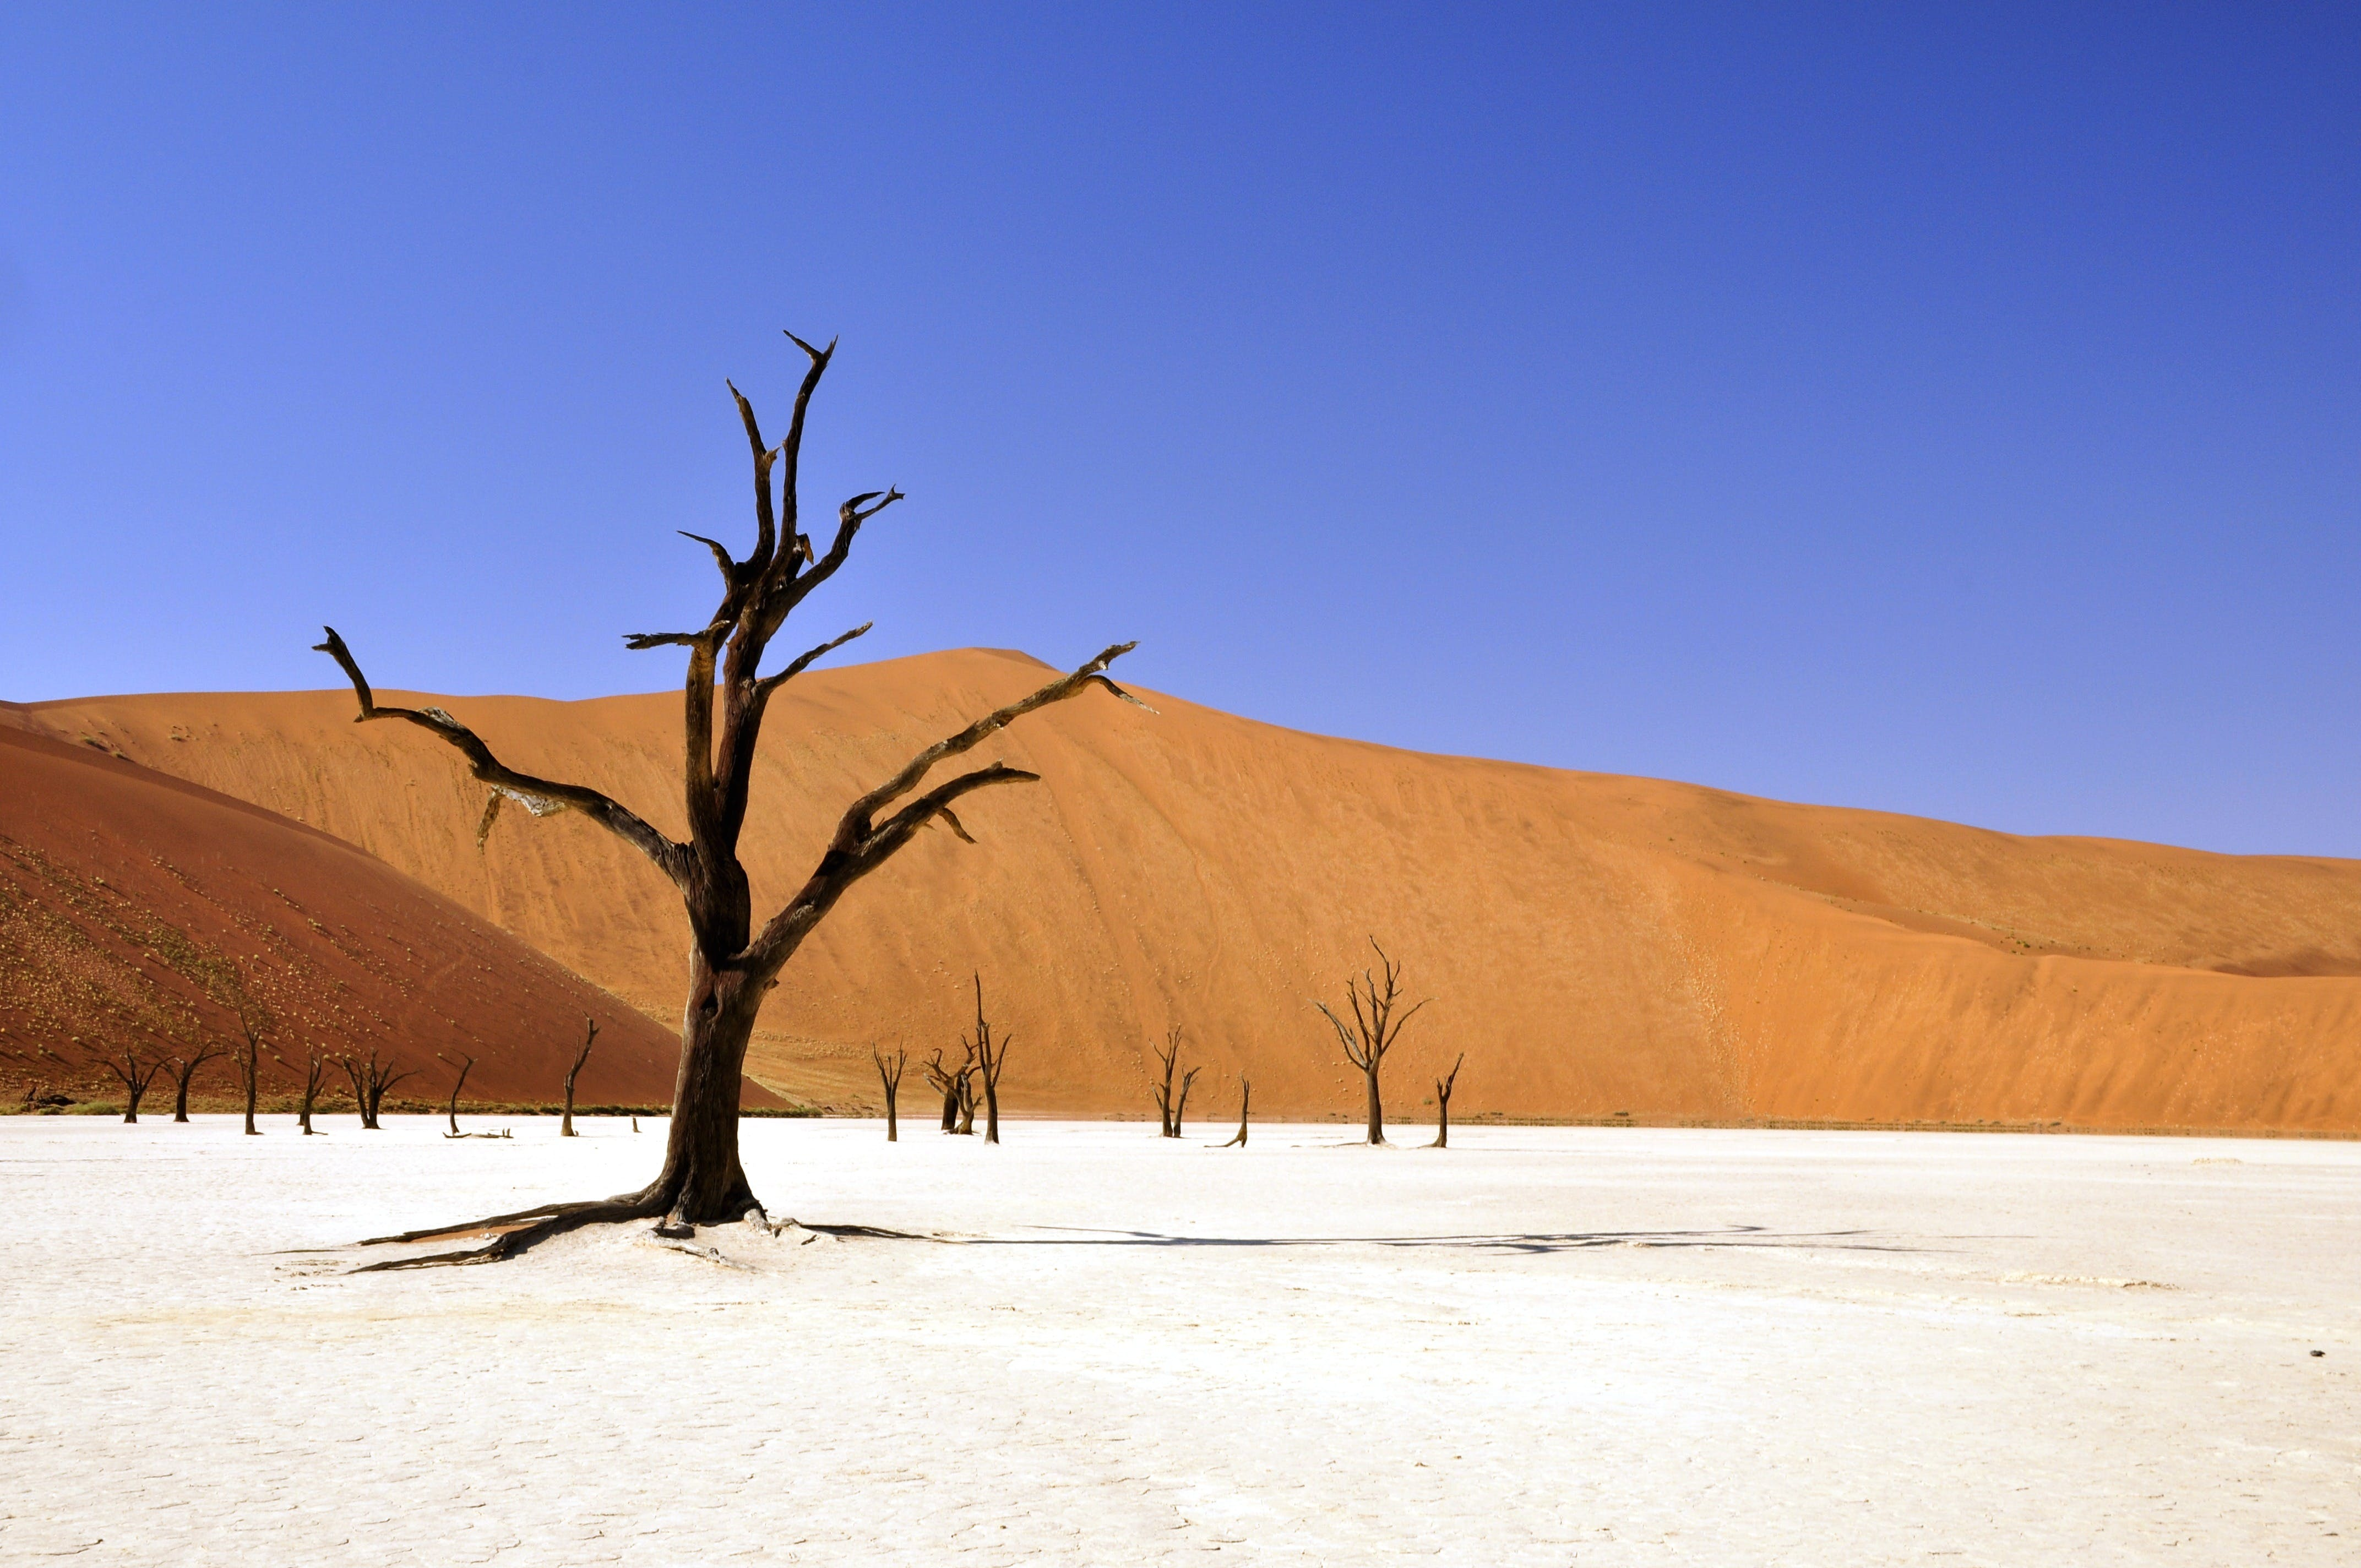 Brown Leafless Tree on Sandy Soil during Daytime